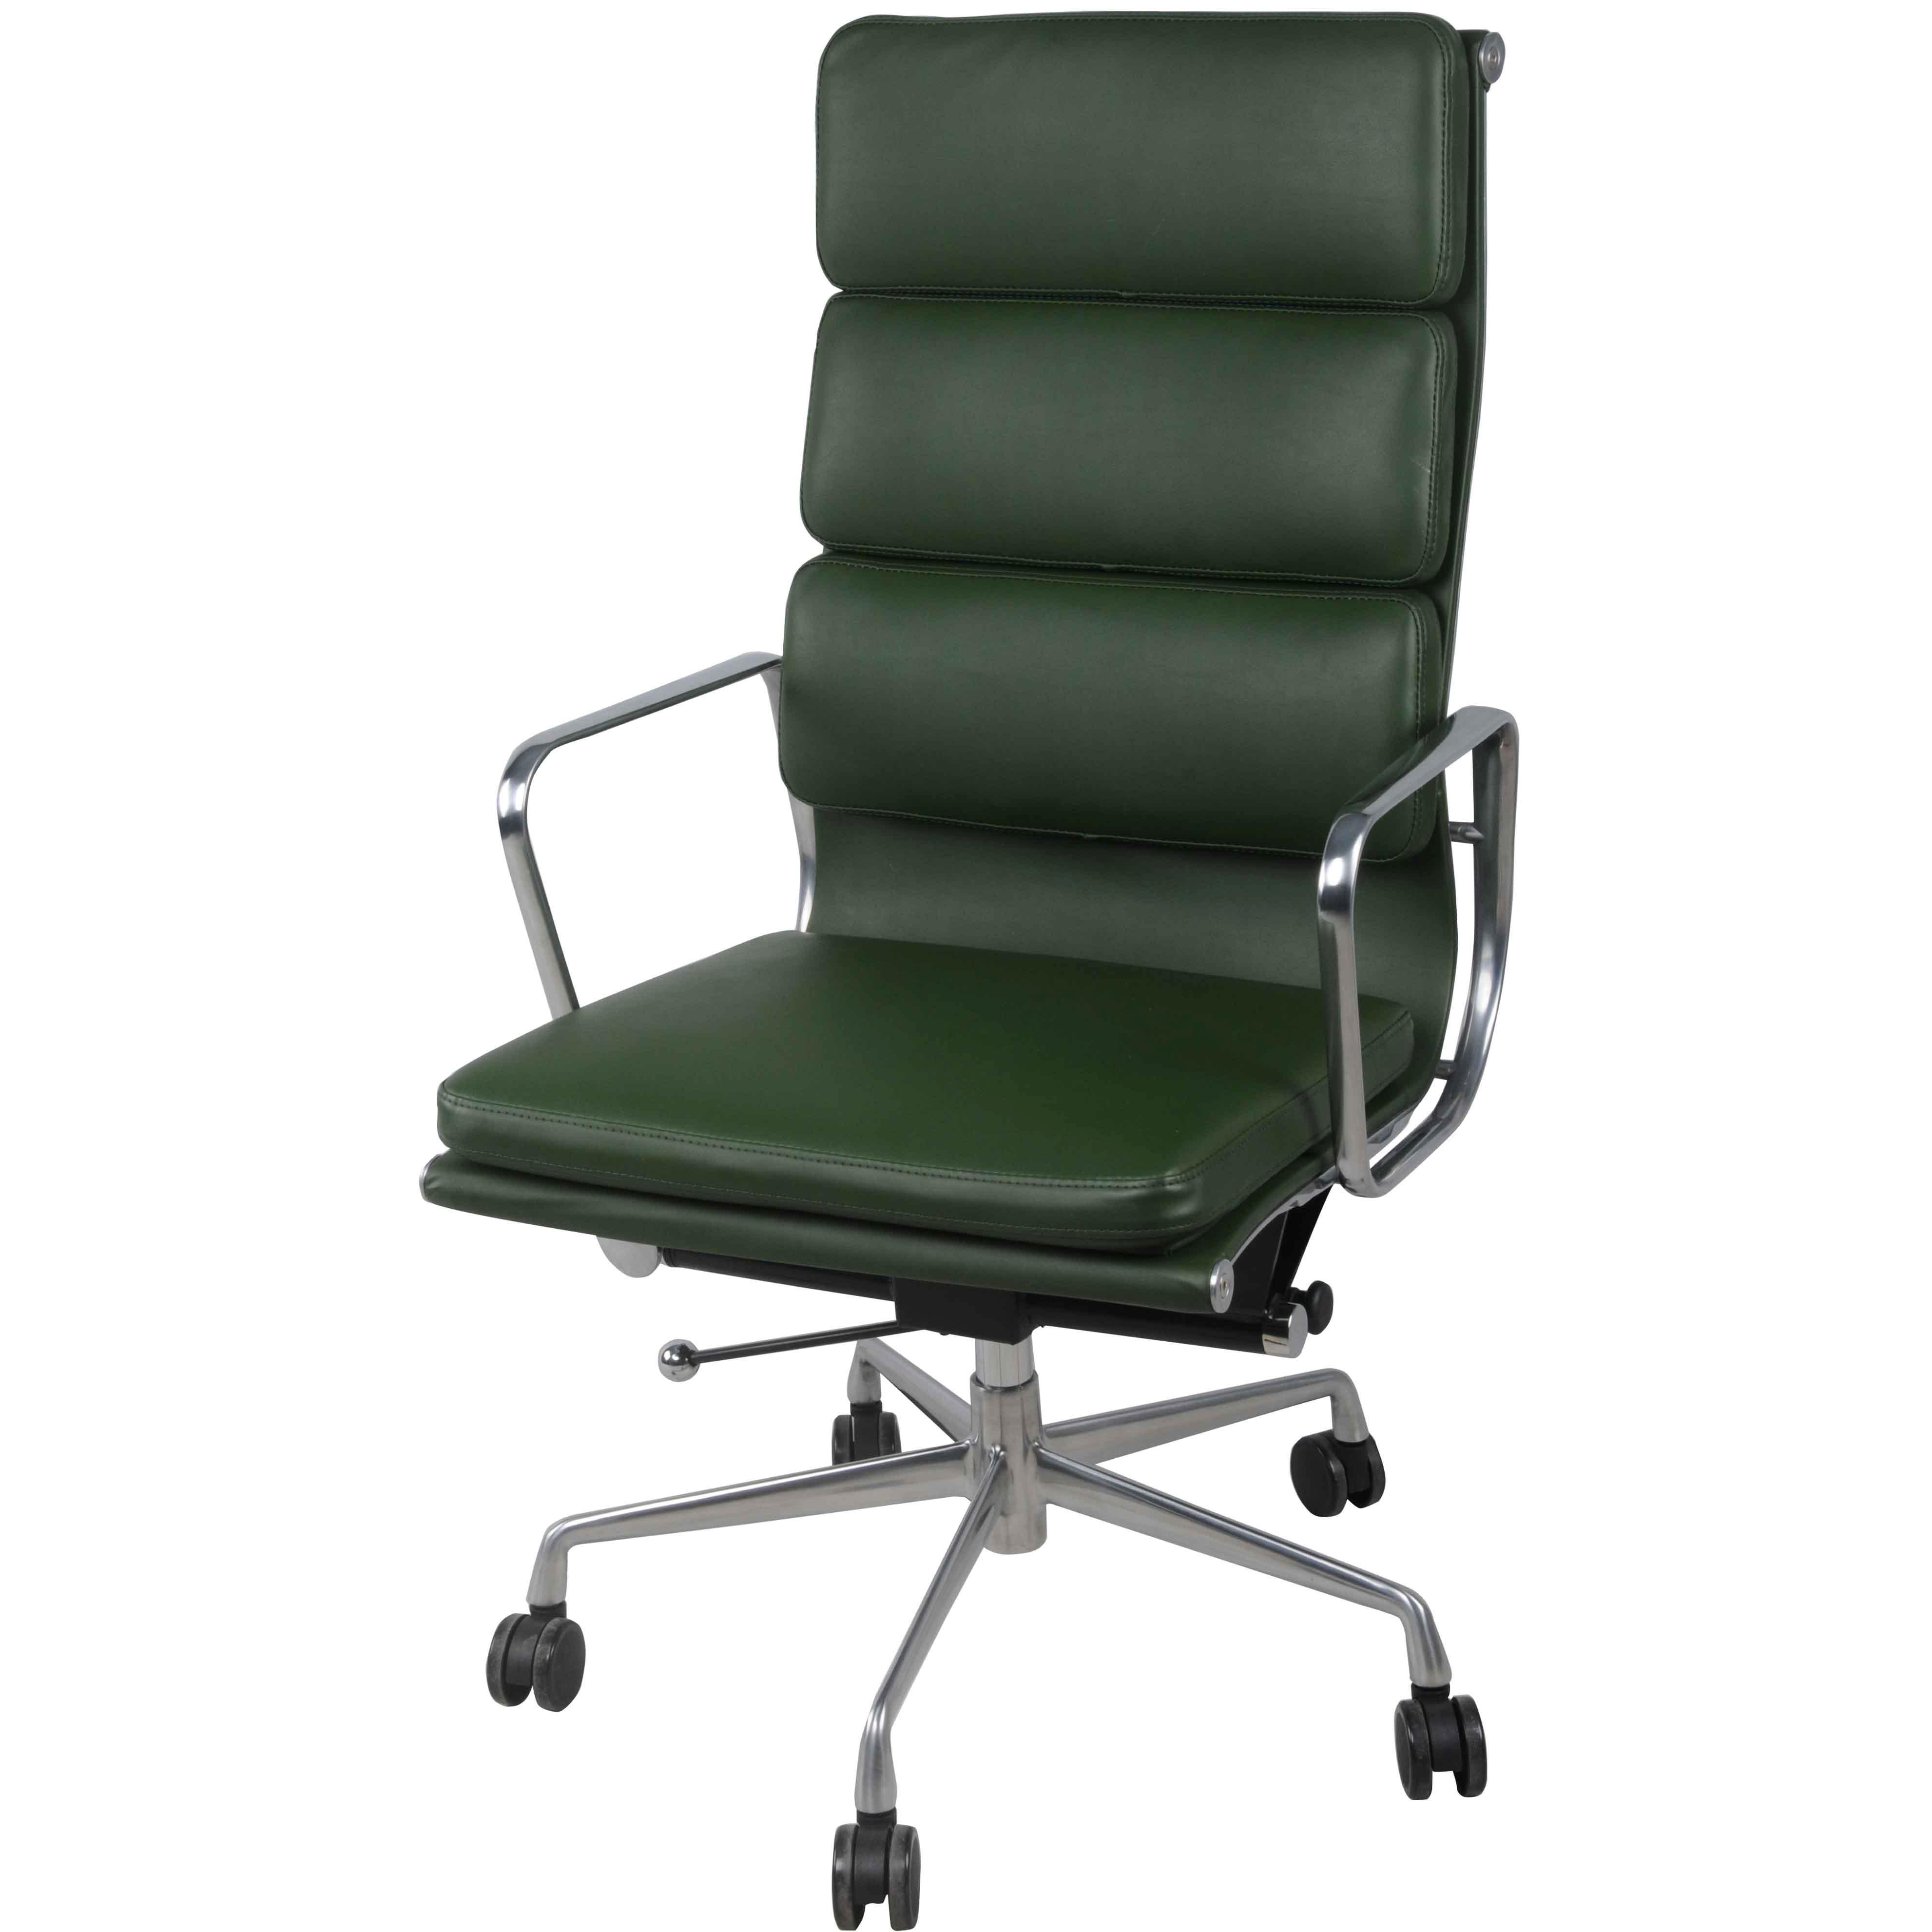 6900003 Va Npd Furniture Wholesale Lifestyle Furniture